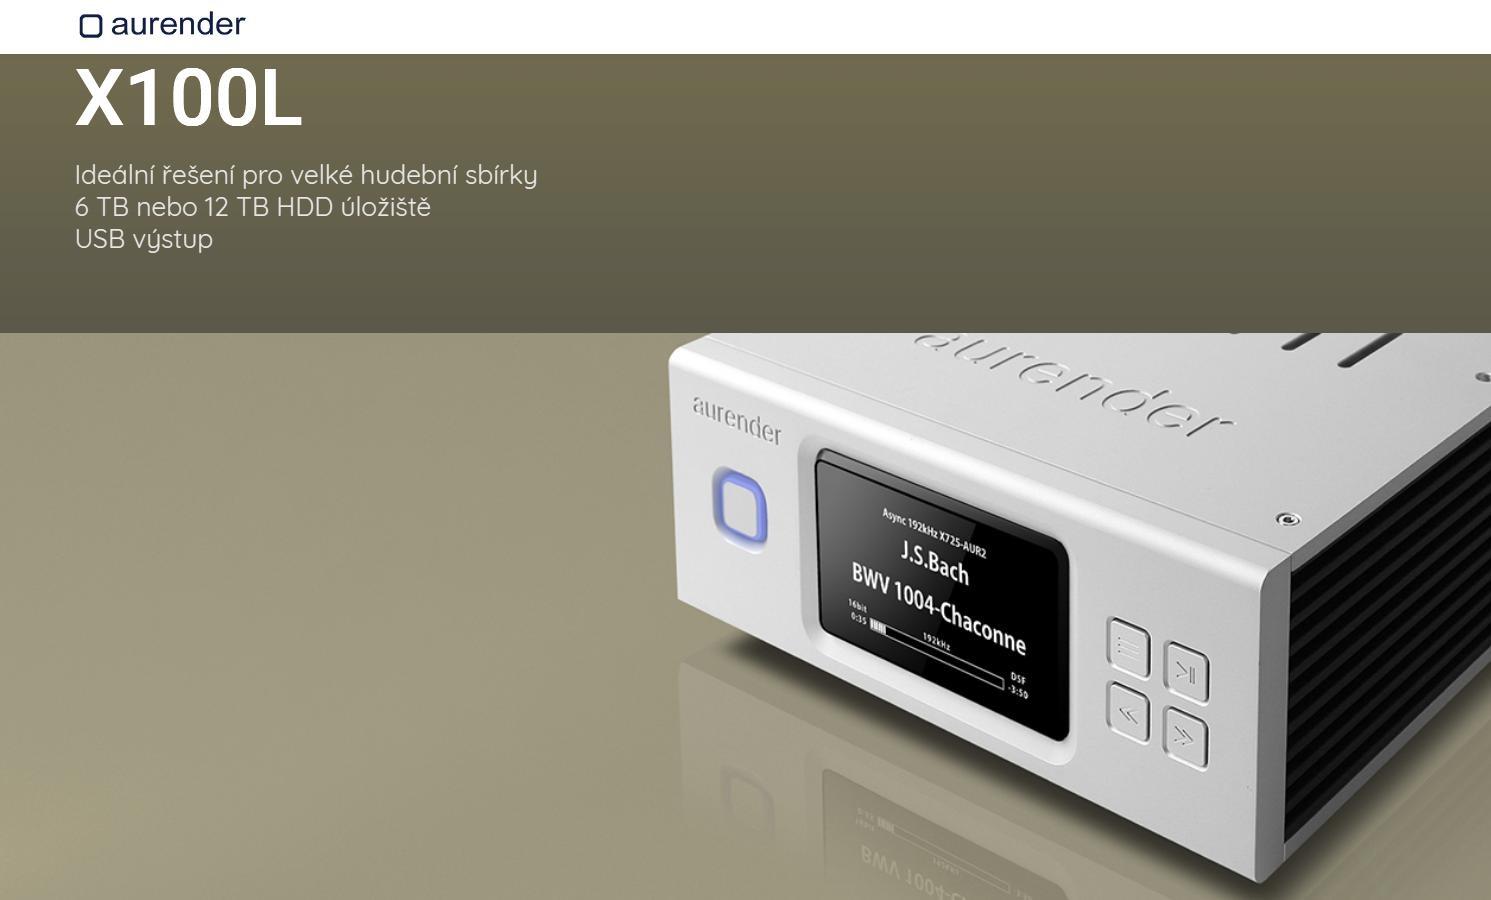 Aurender X100L - 12TB